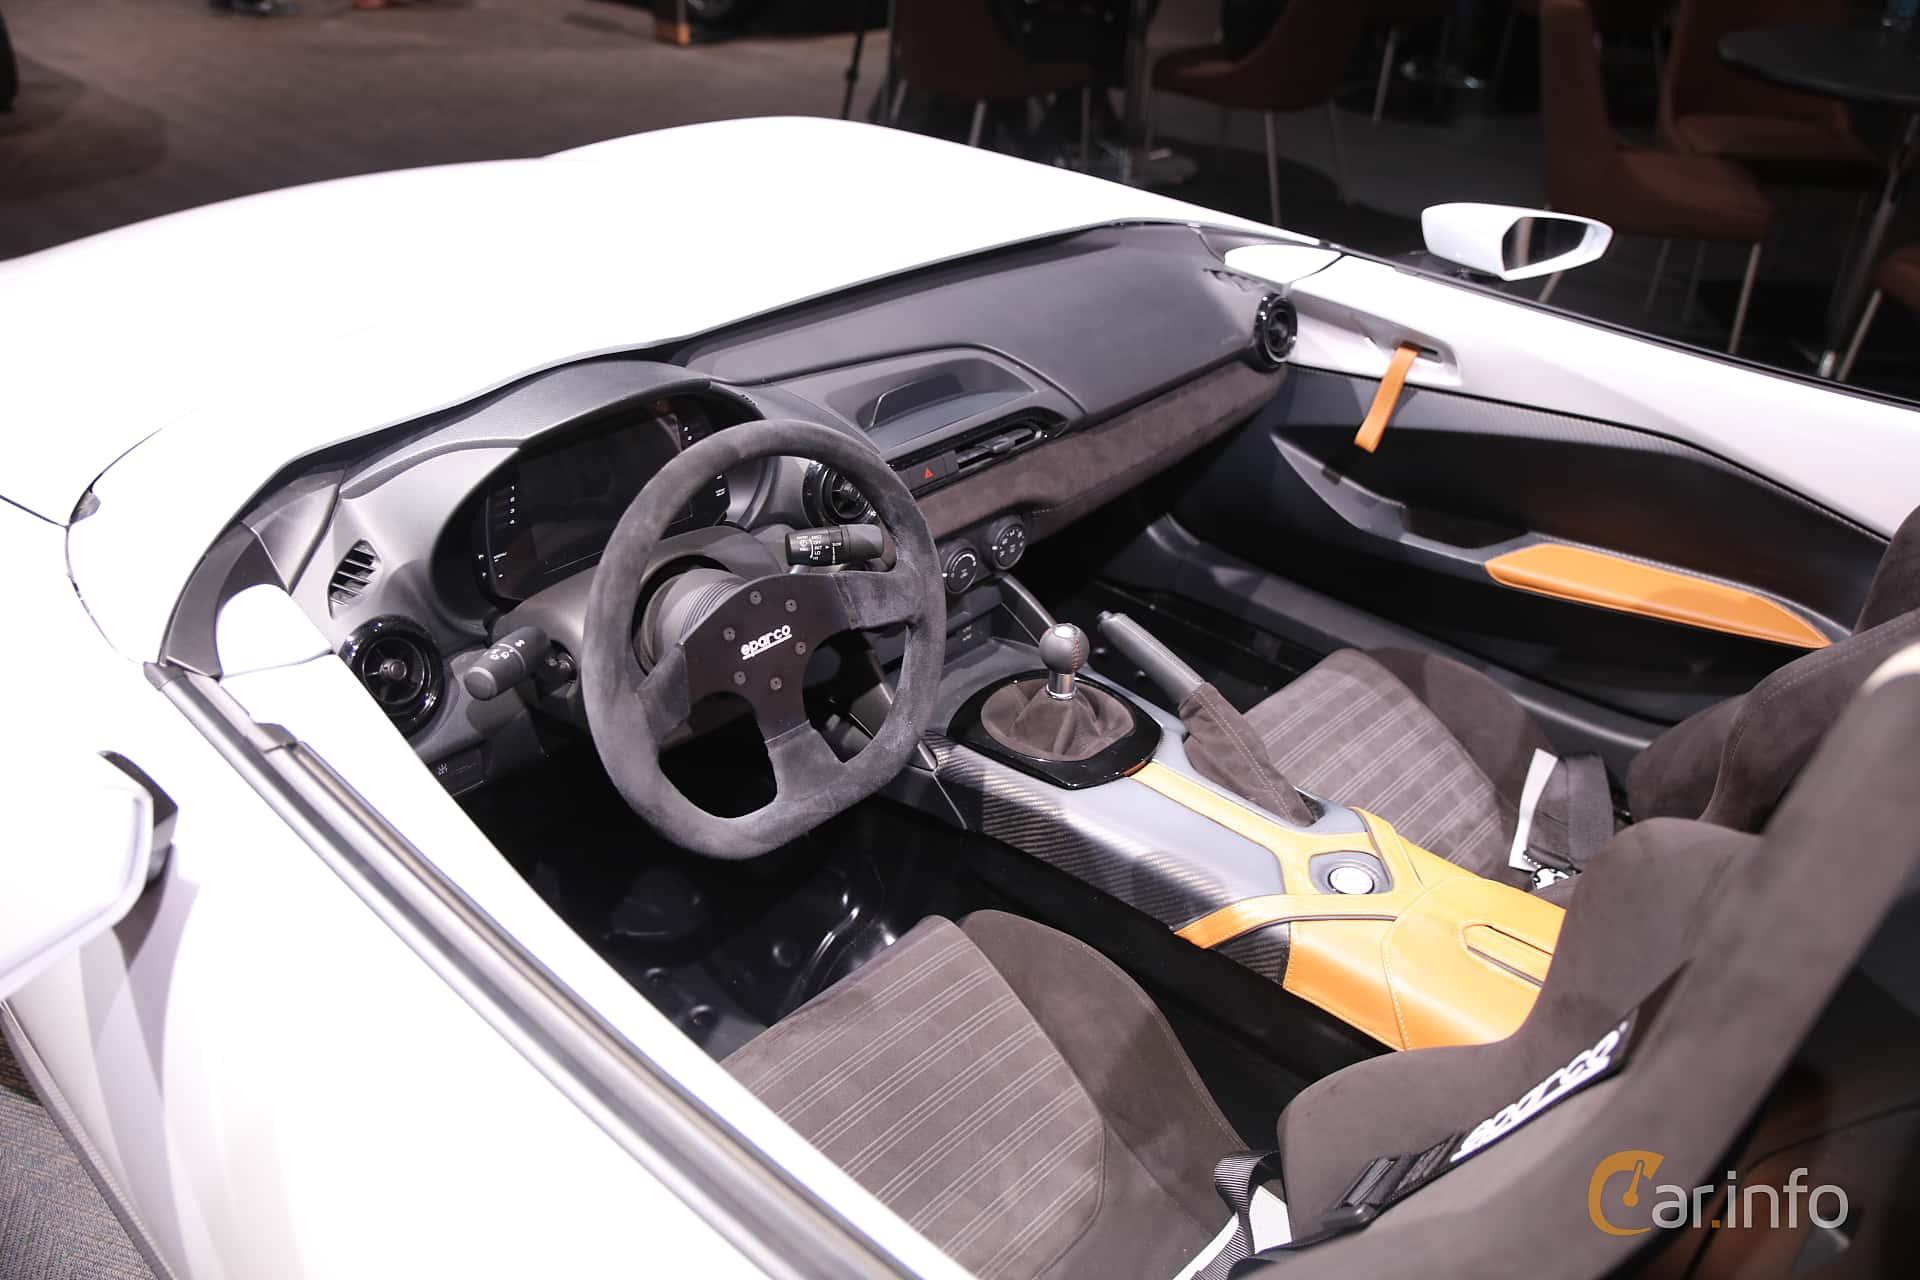 https://s.car.info/image_files/1920/mazda-mx-5-miata-speedster-evolution-interior-north-american-international-auto-show-2017-2-318263.jpg